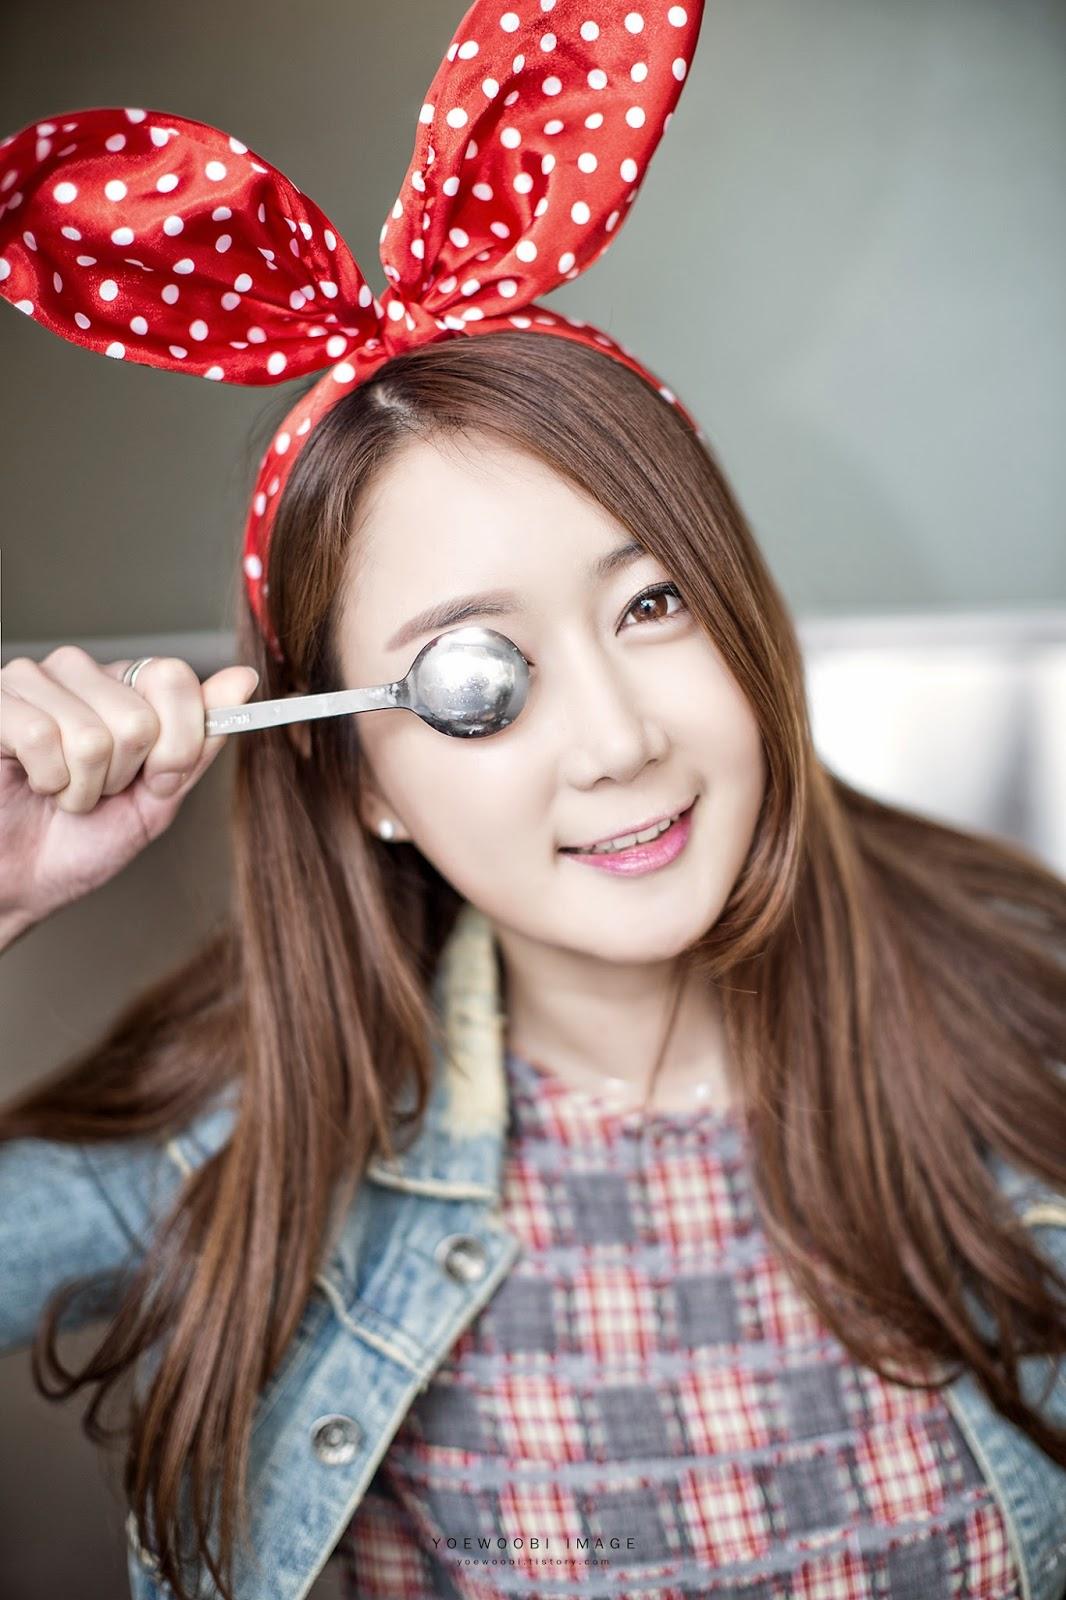 3 Han Chae Yee - IN-N-OUT - very cute asian girl-girlcute4u.blogspot.com